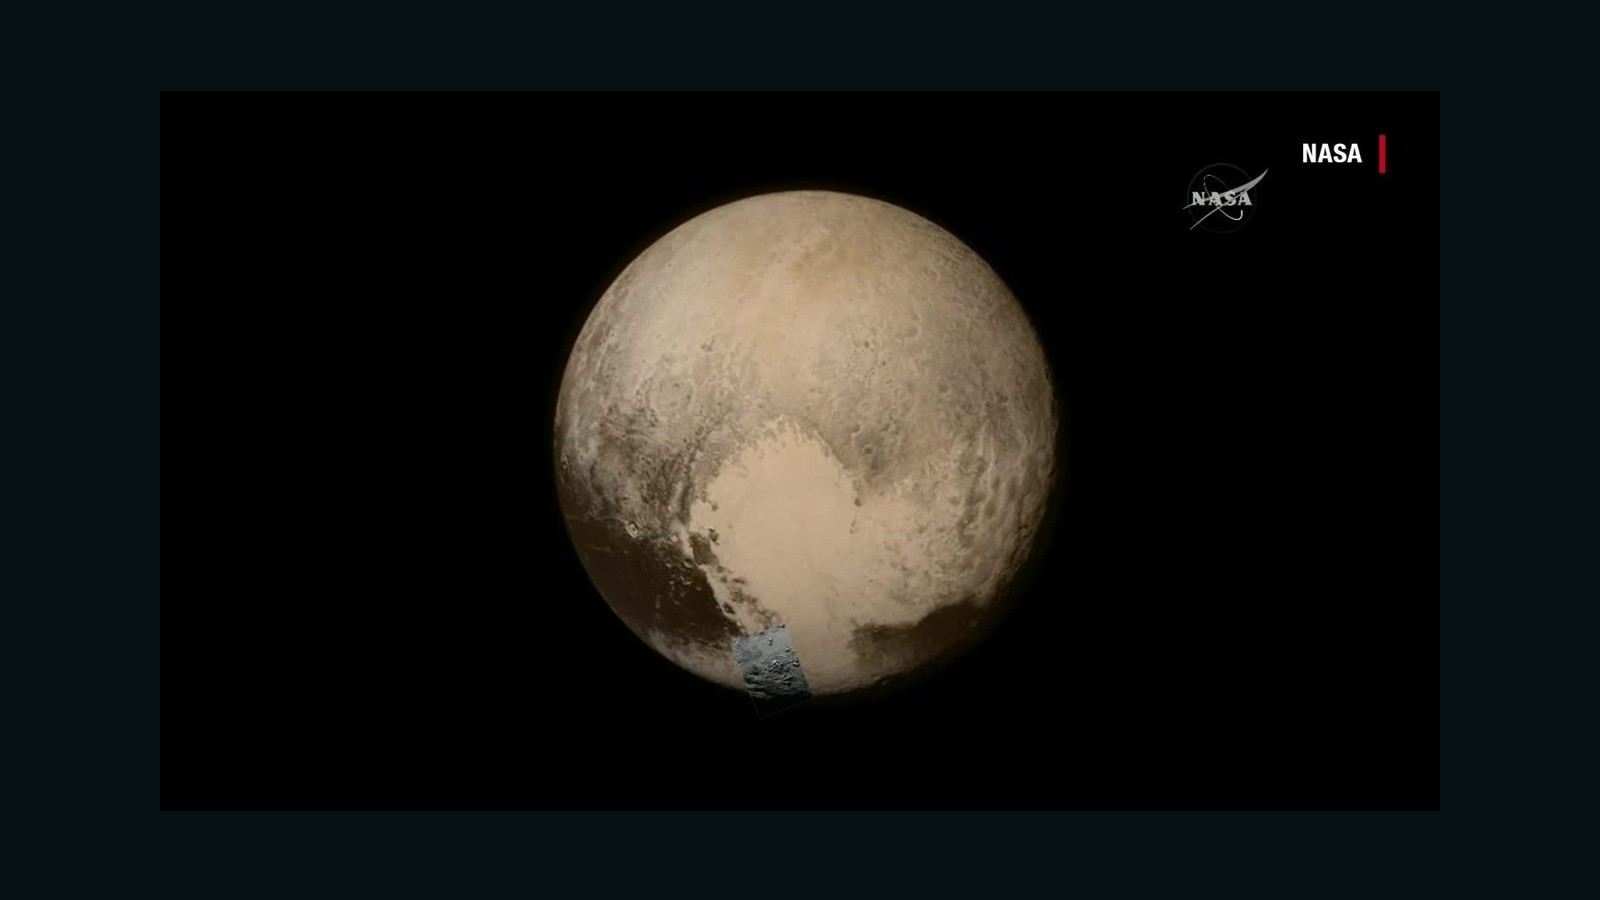 07 >> NASA reveals new close-up images of Pluto - CNN Video